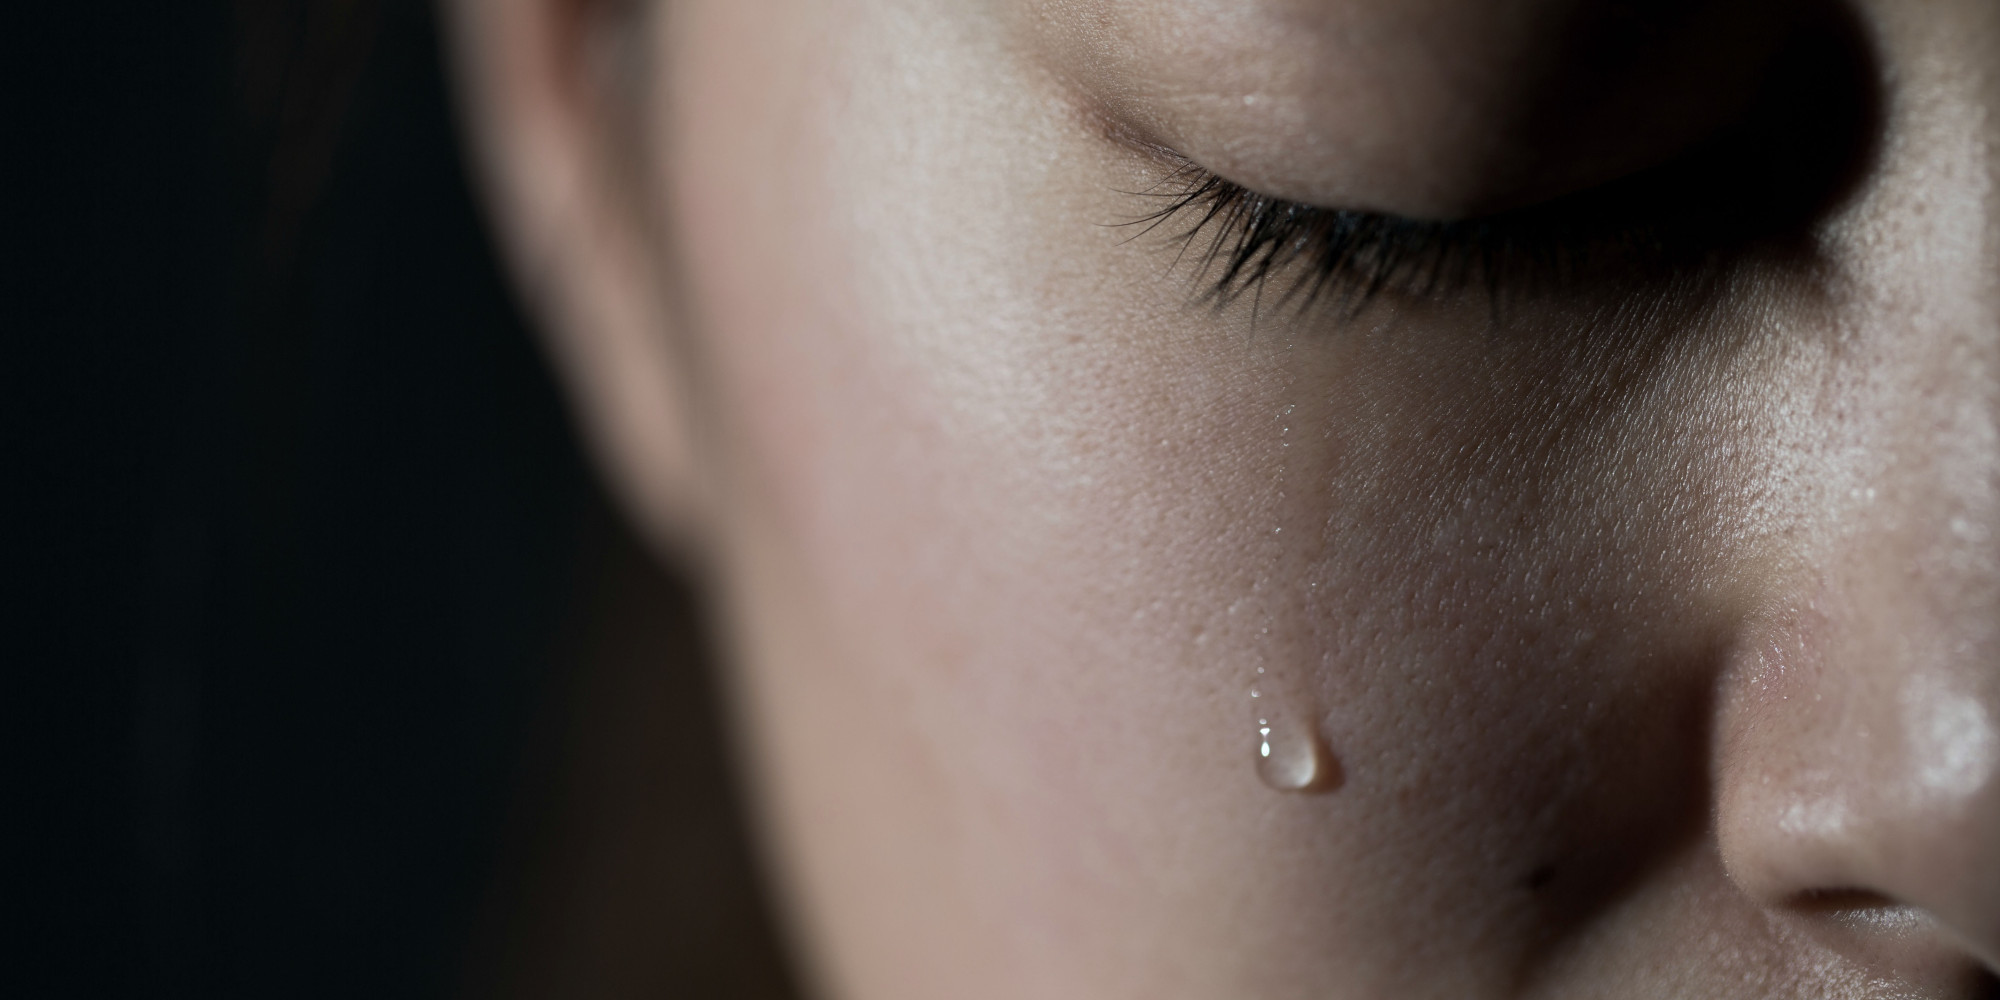 A sad little girl, a broken world, a tear.